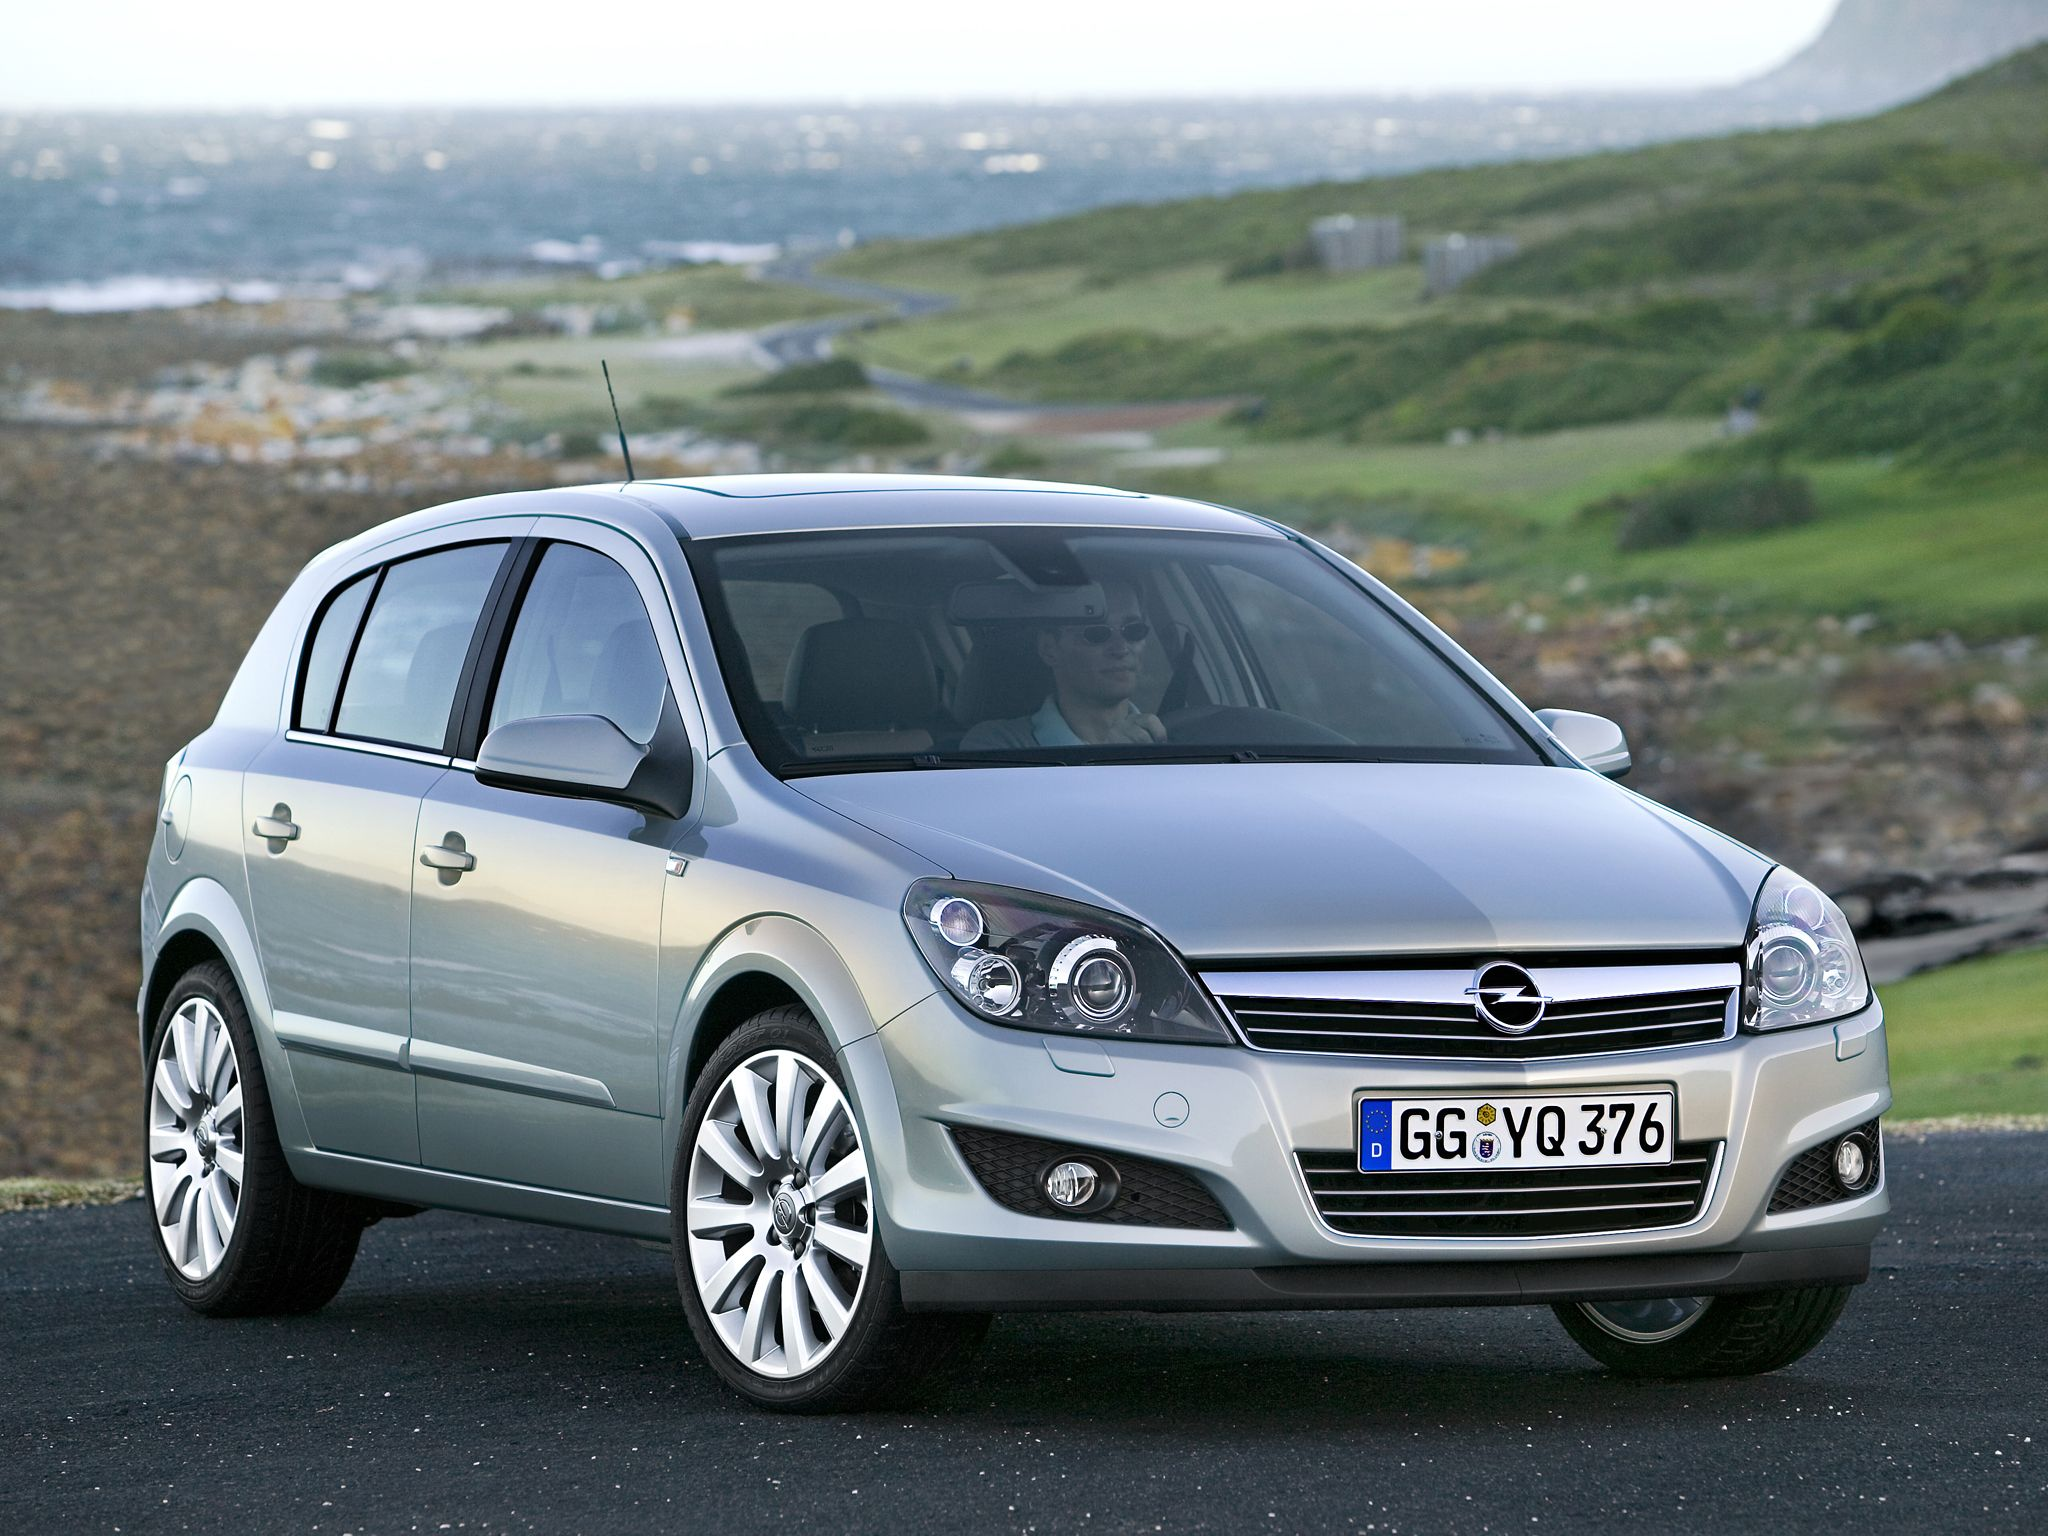 Pin Von Marcin Guzy Auf Opel Opel Astra Automobil Fahrzeuge